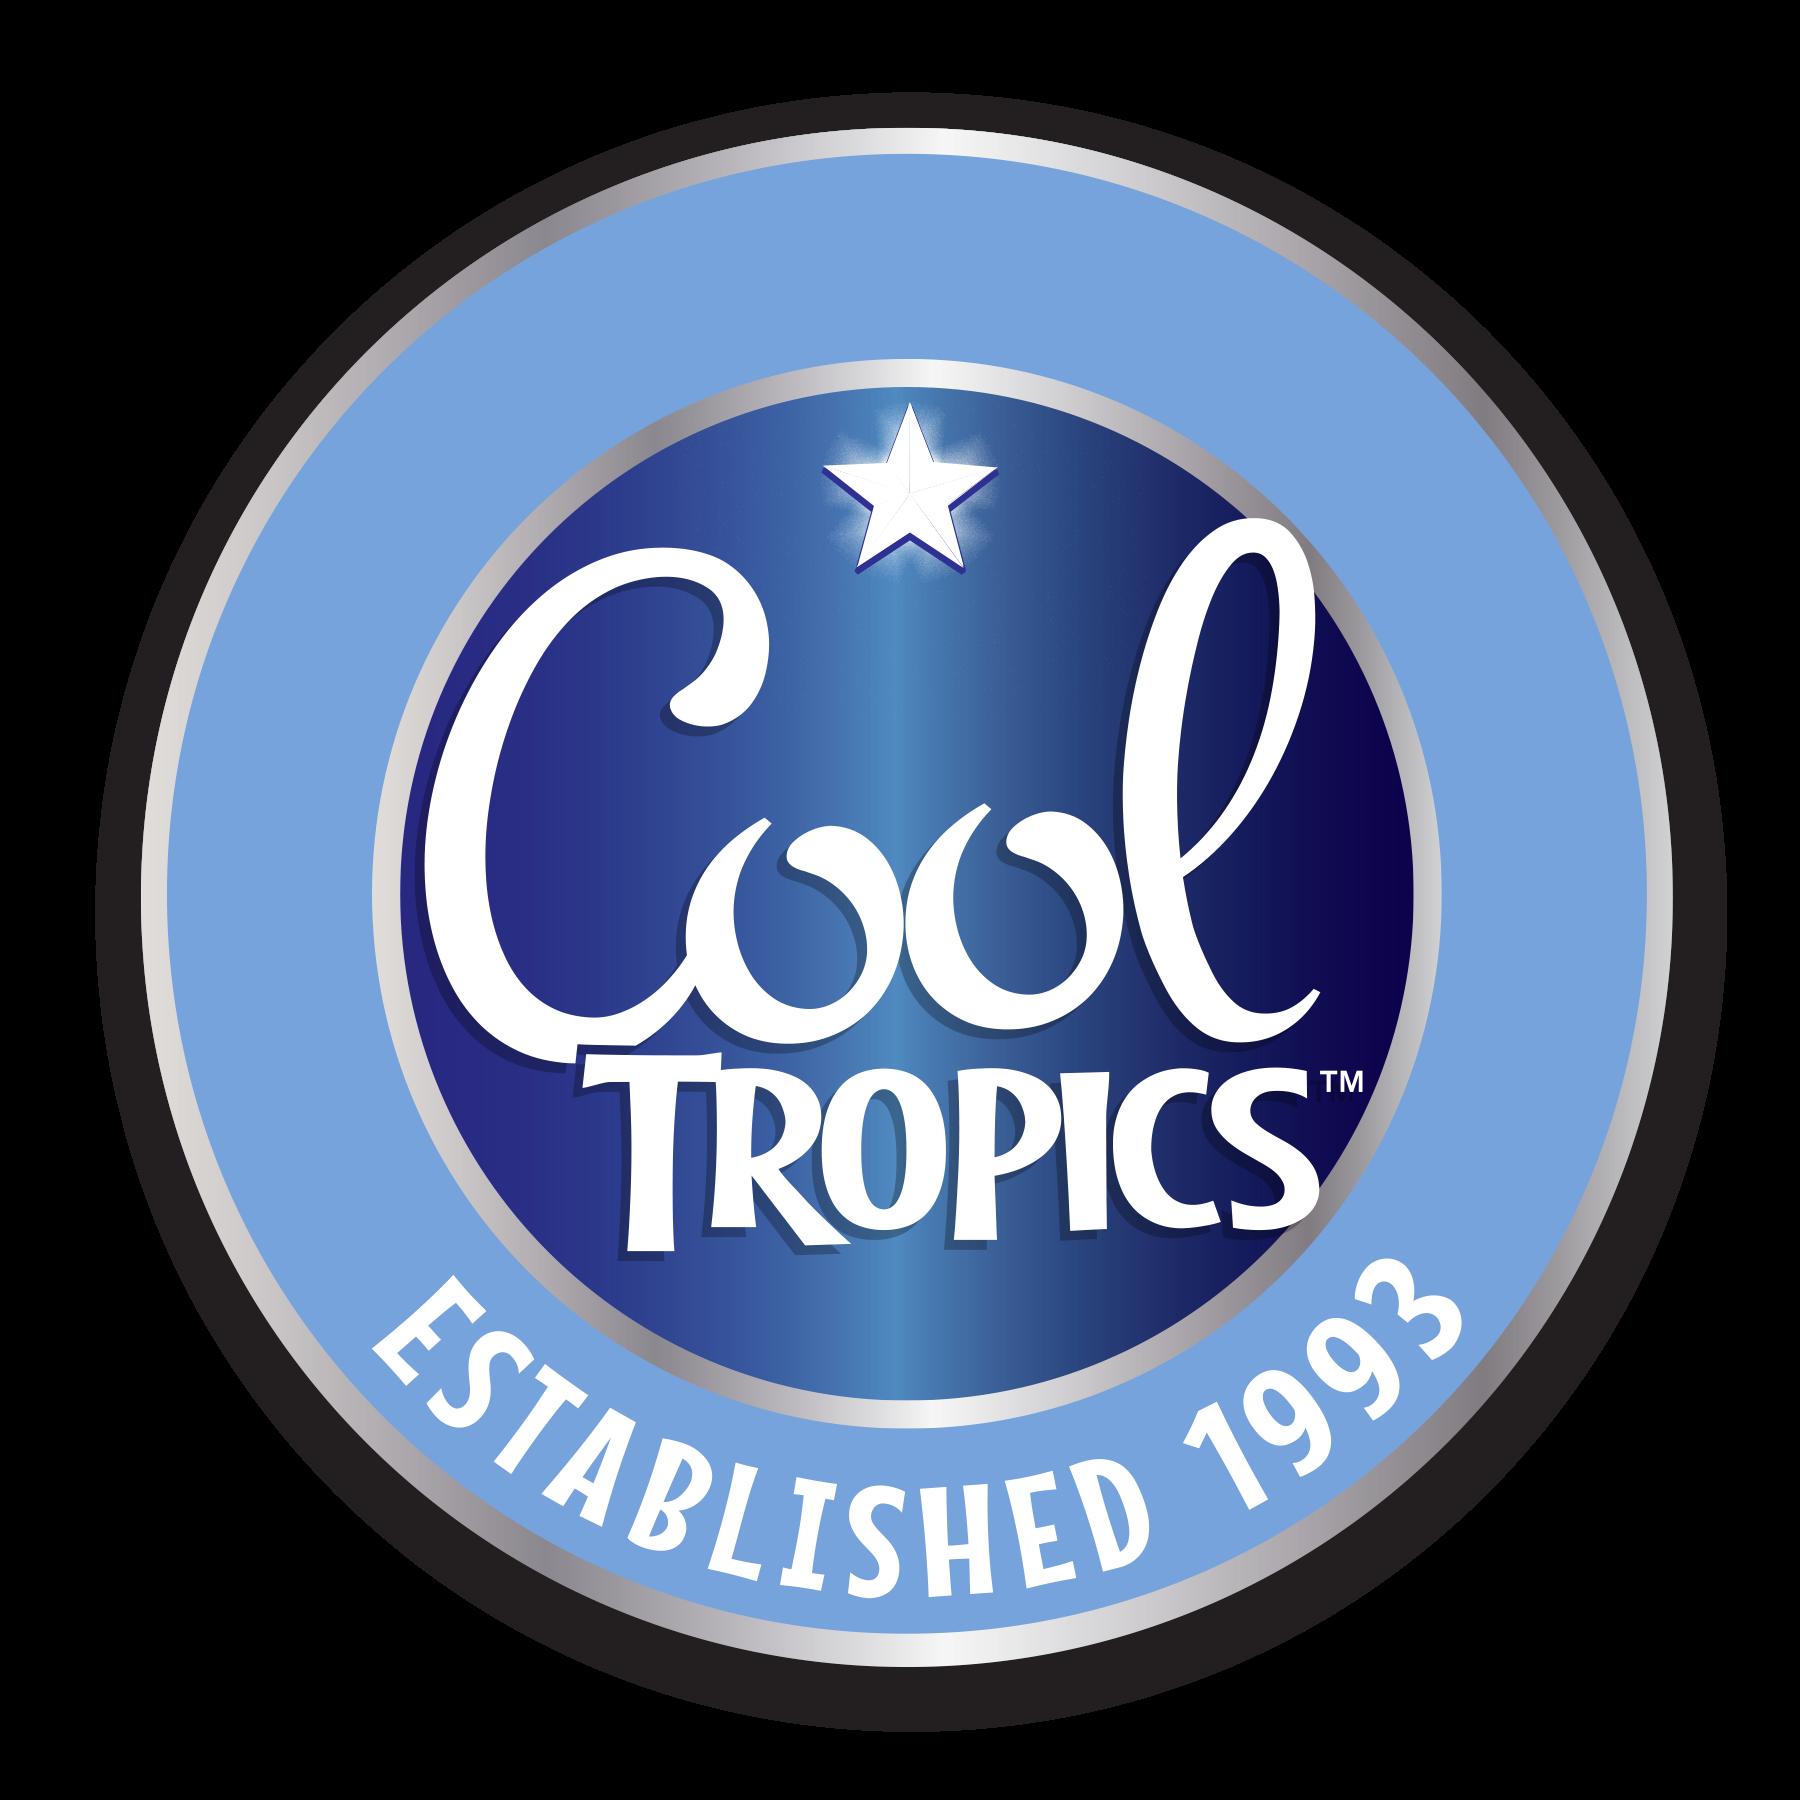 CoolT_RoundLogo_2019_B